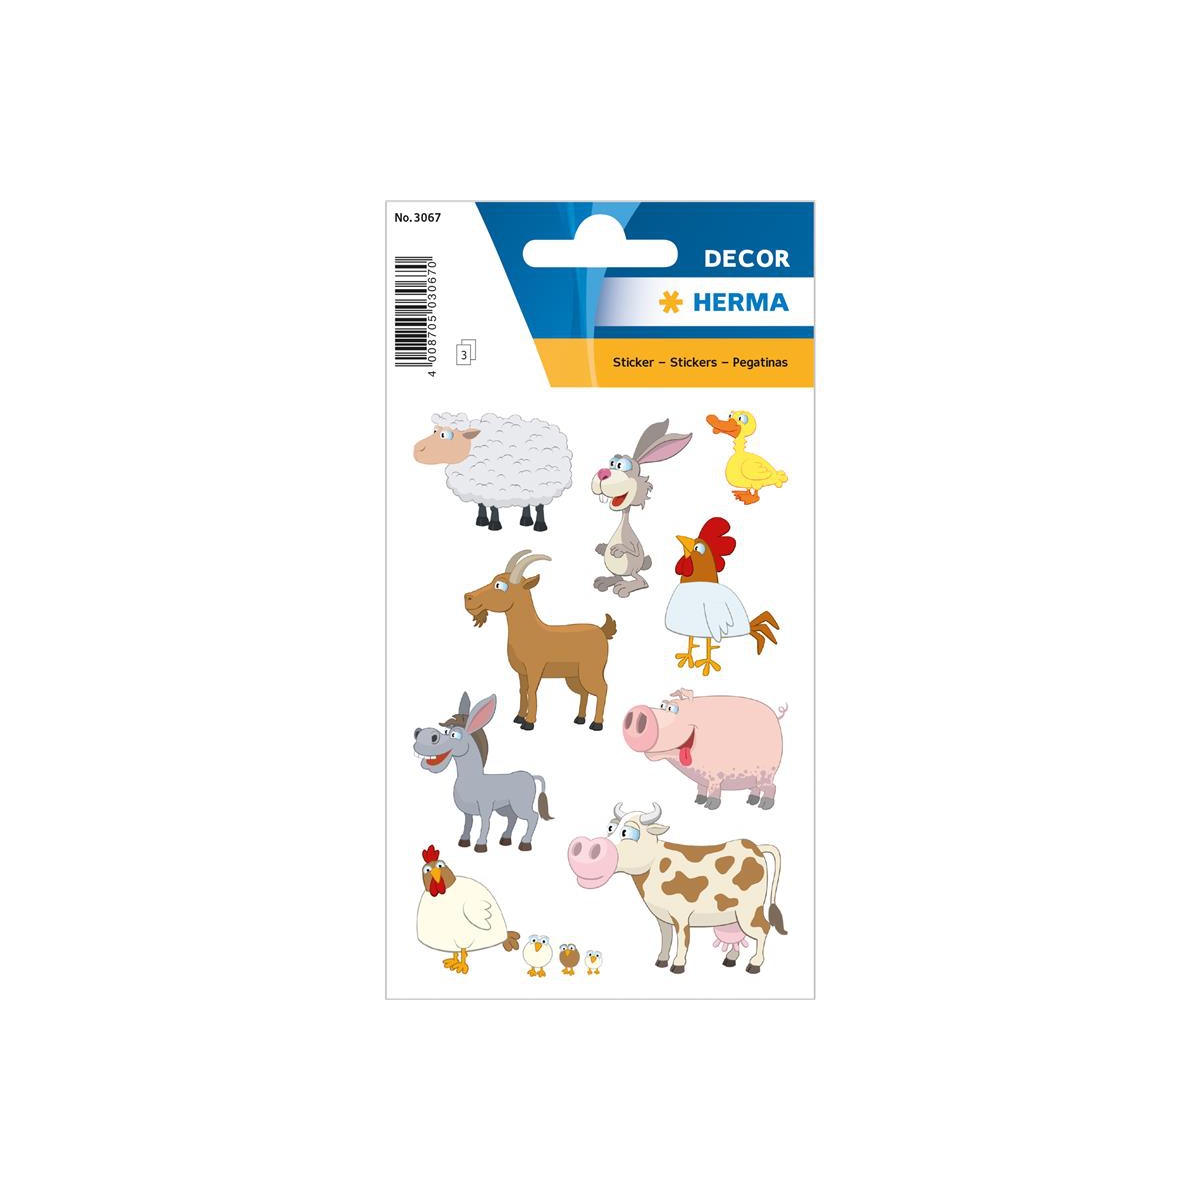 "HERMA Sticker DECOR /""Igel/"" 3 Blatt à 16 Sticker"